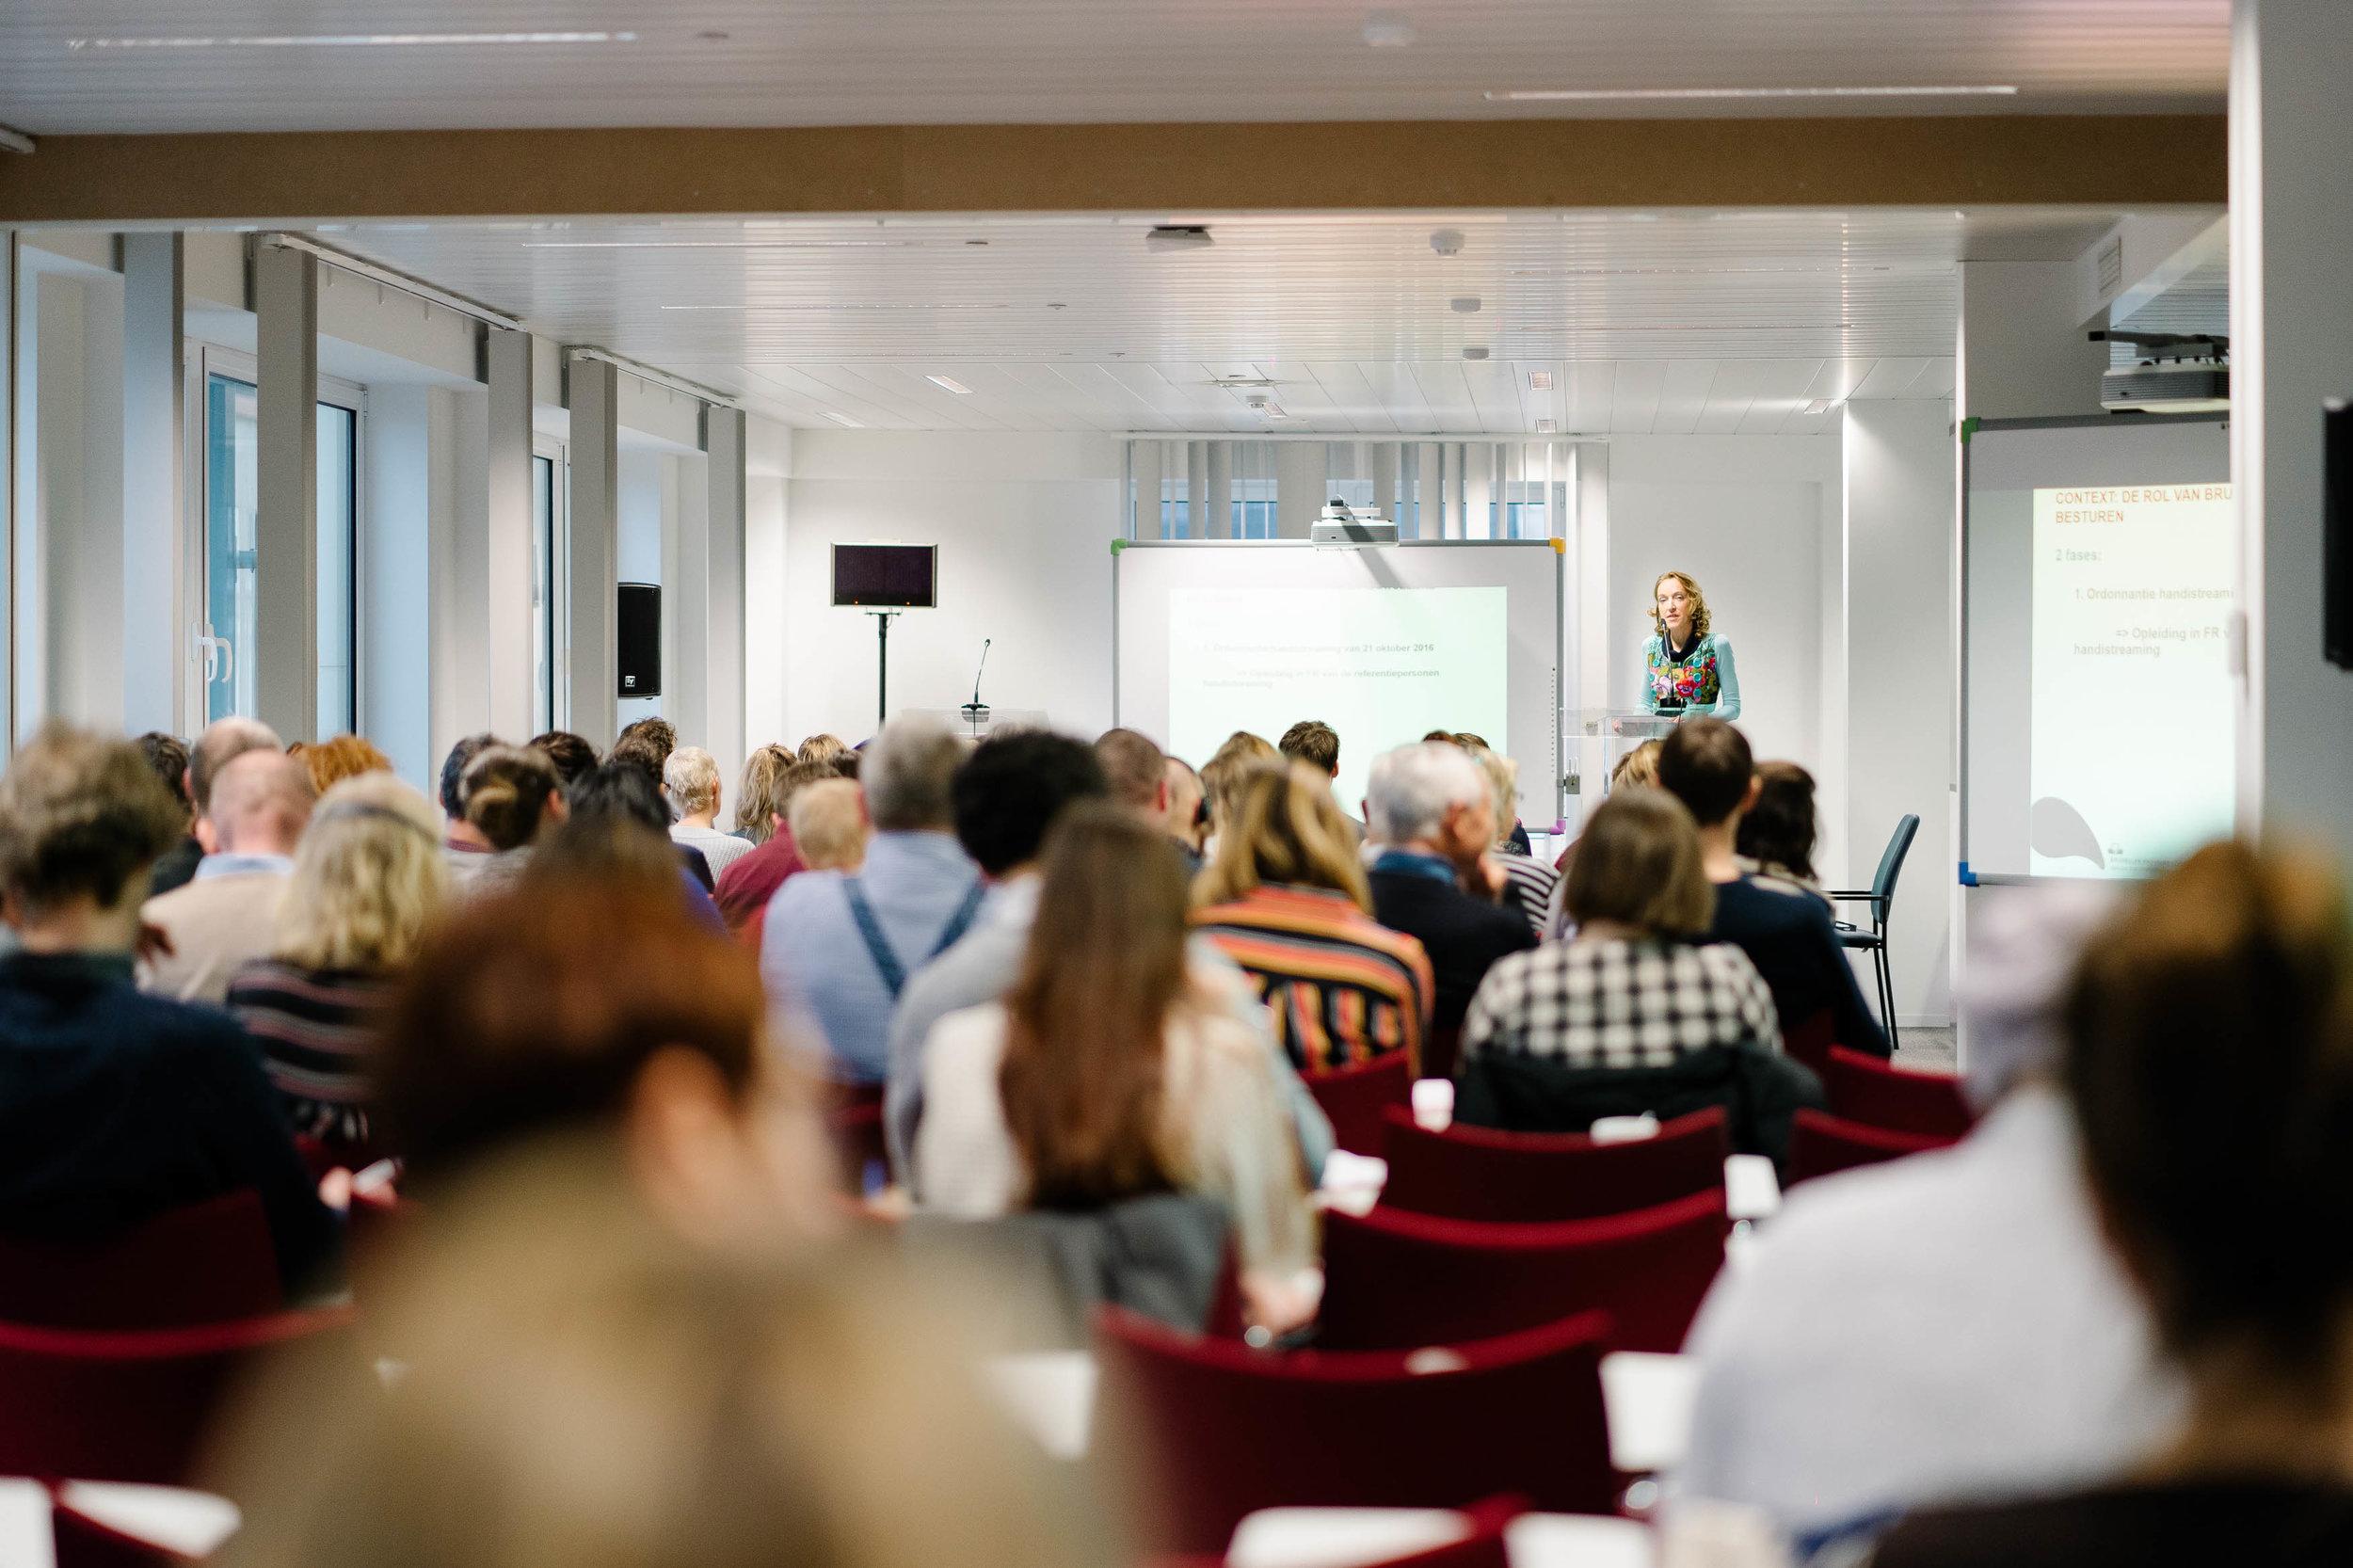 photographe-conference-bruxelles-corporate-10.jpg